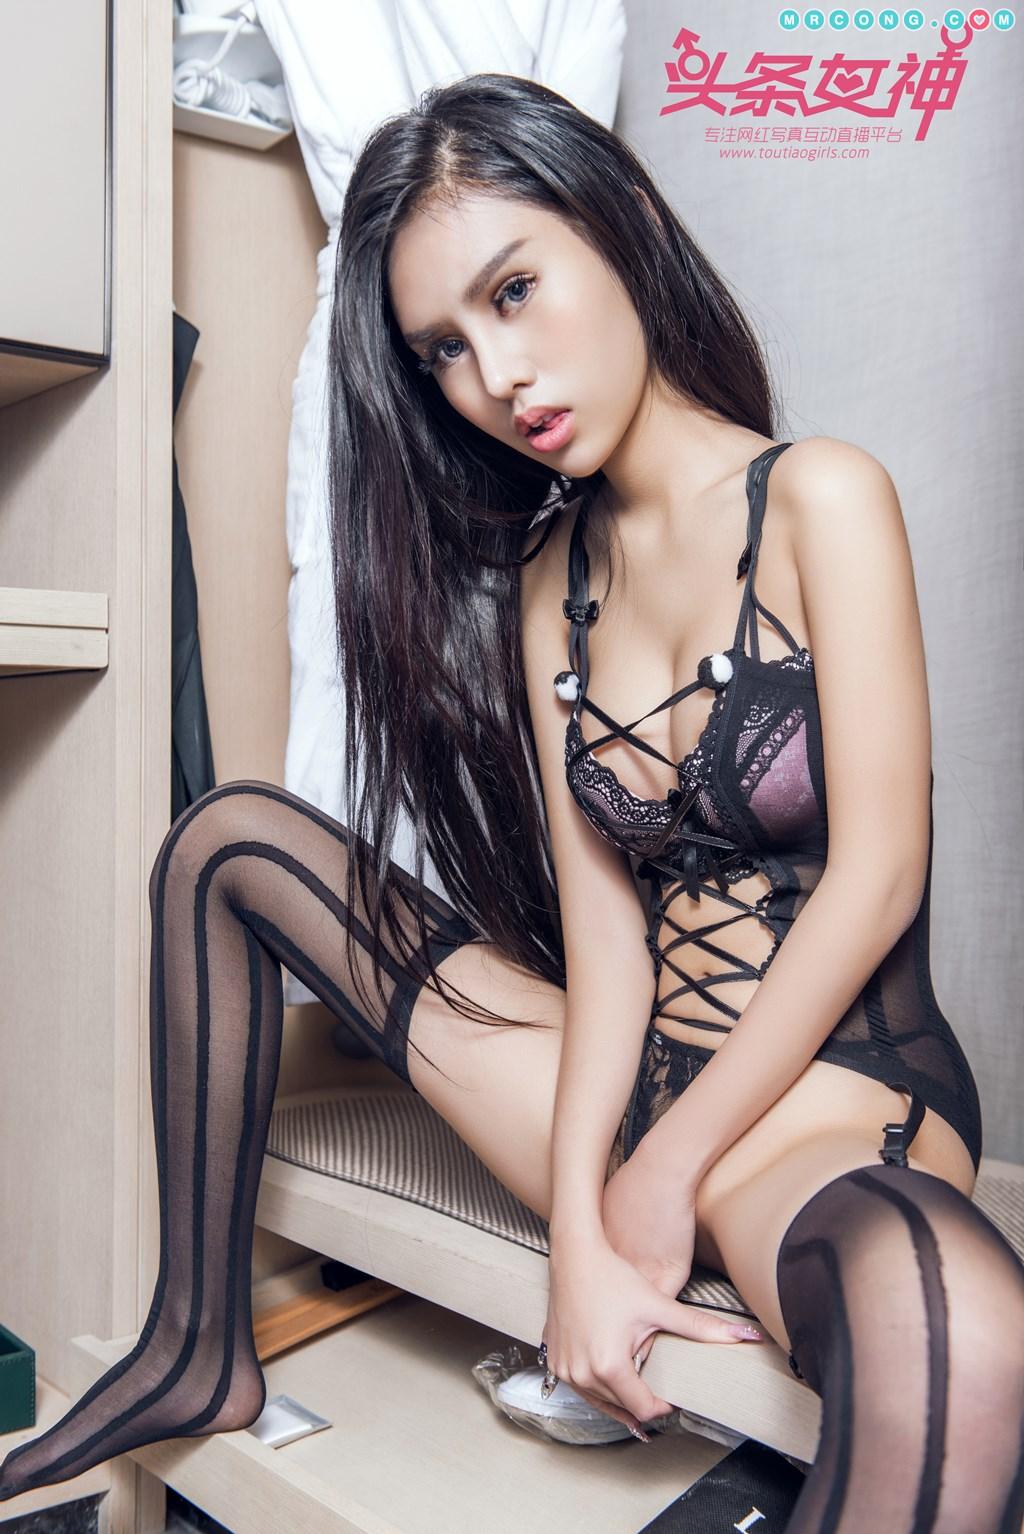 Image TouTiao-2017-12-05-Chen-Di-Ya-MrCong.com-025 in post TouTiao 2017-12-05: Người mẫu Chen Di Ya (陈迪垭) (35 ảnh)